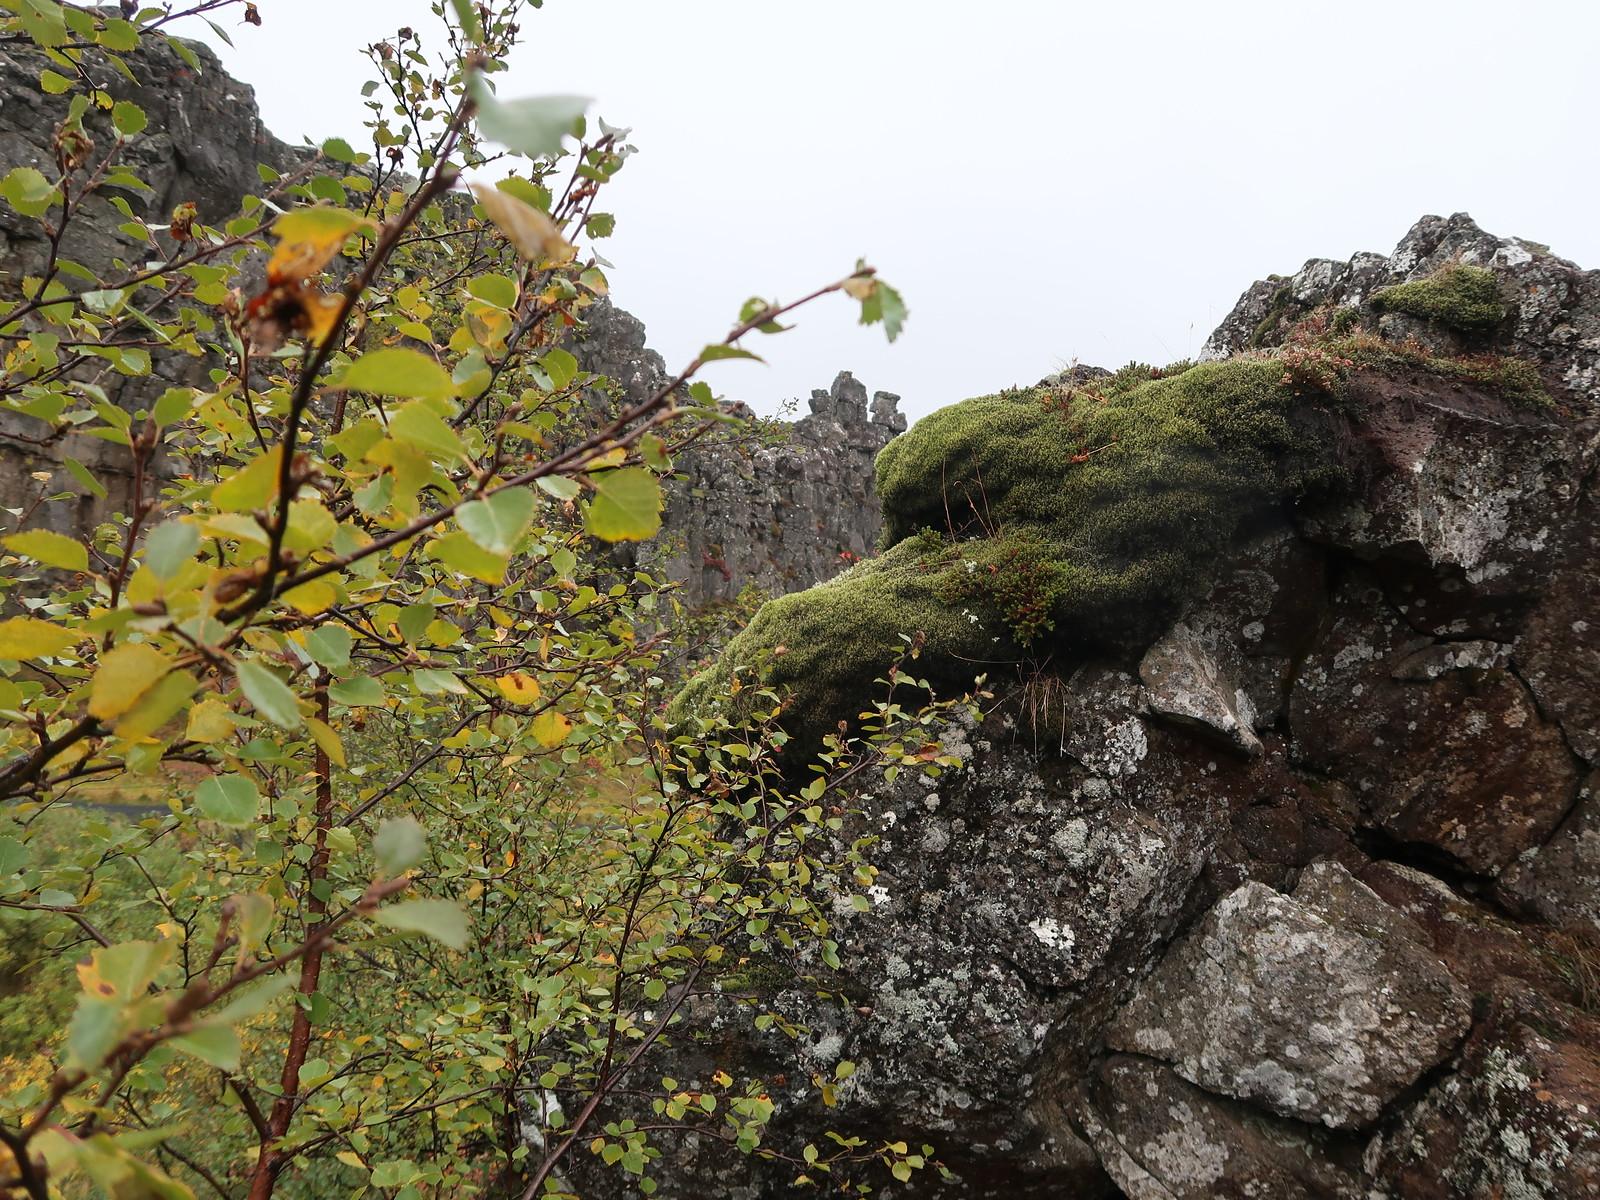 5D_Vik-Reykjavik_Þingvellir (Thingvellir) National Park, 1.Parlament 10-18.Jh.